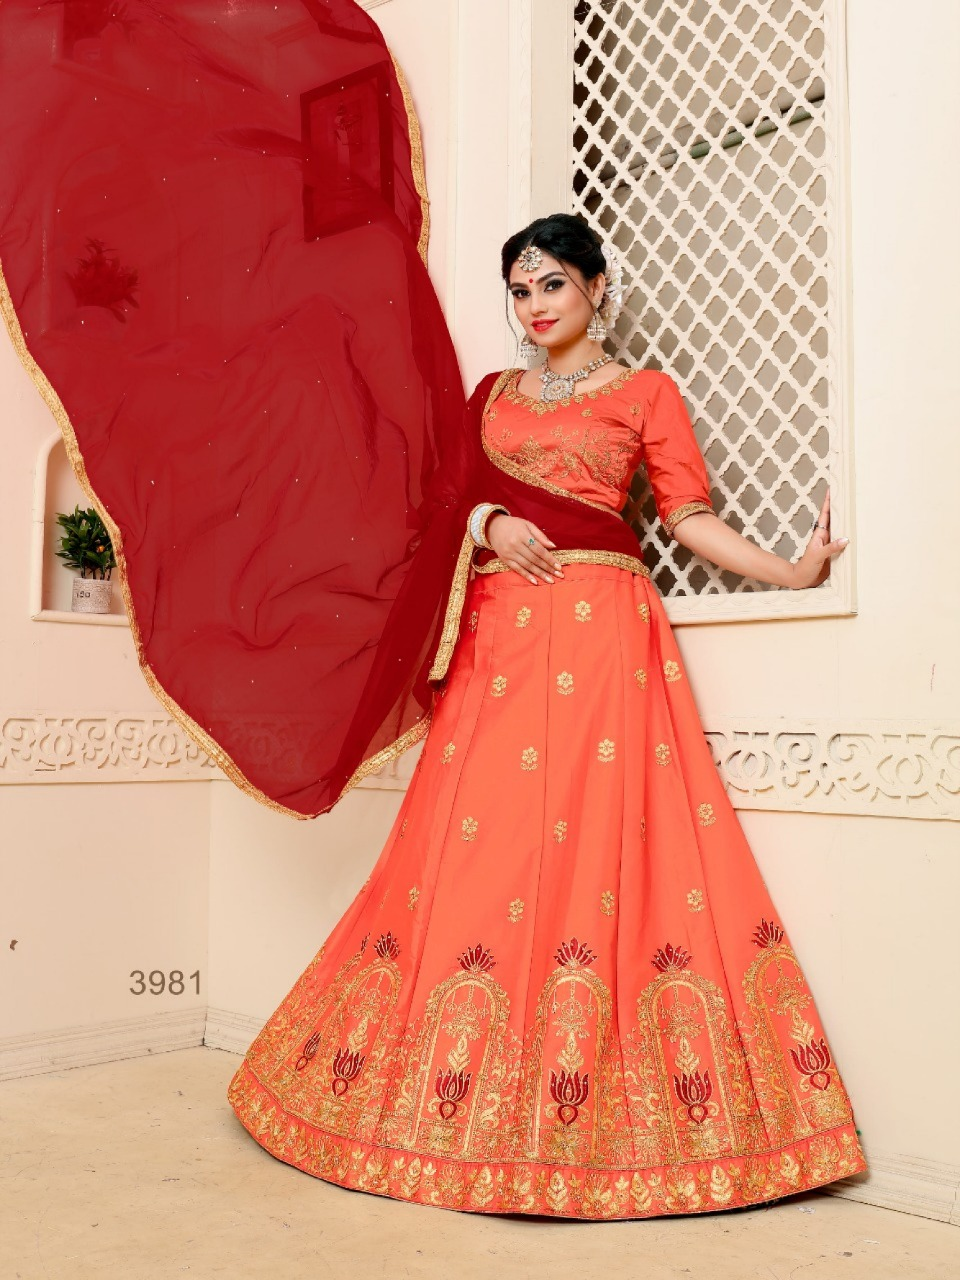 Sanskar Style Fame Designer Pure Satin Lehenga Wholesale Lot